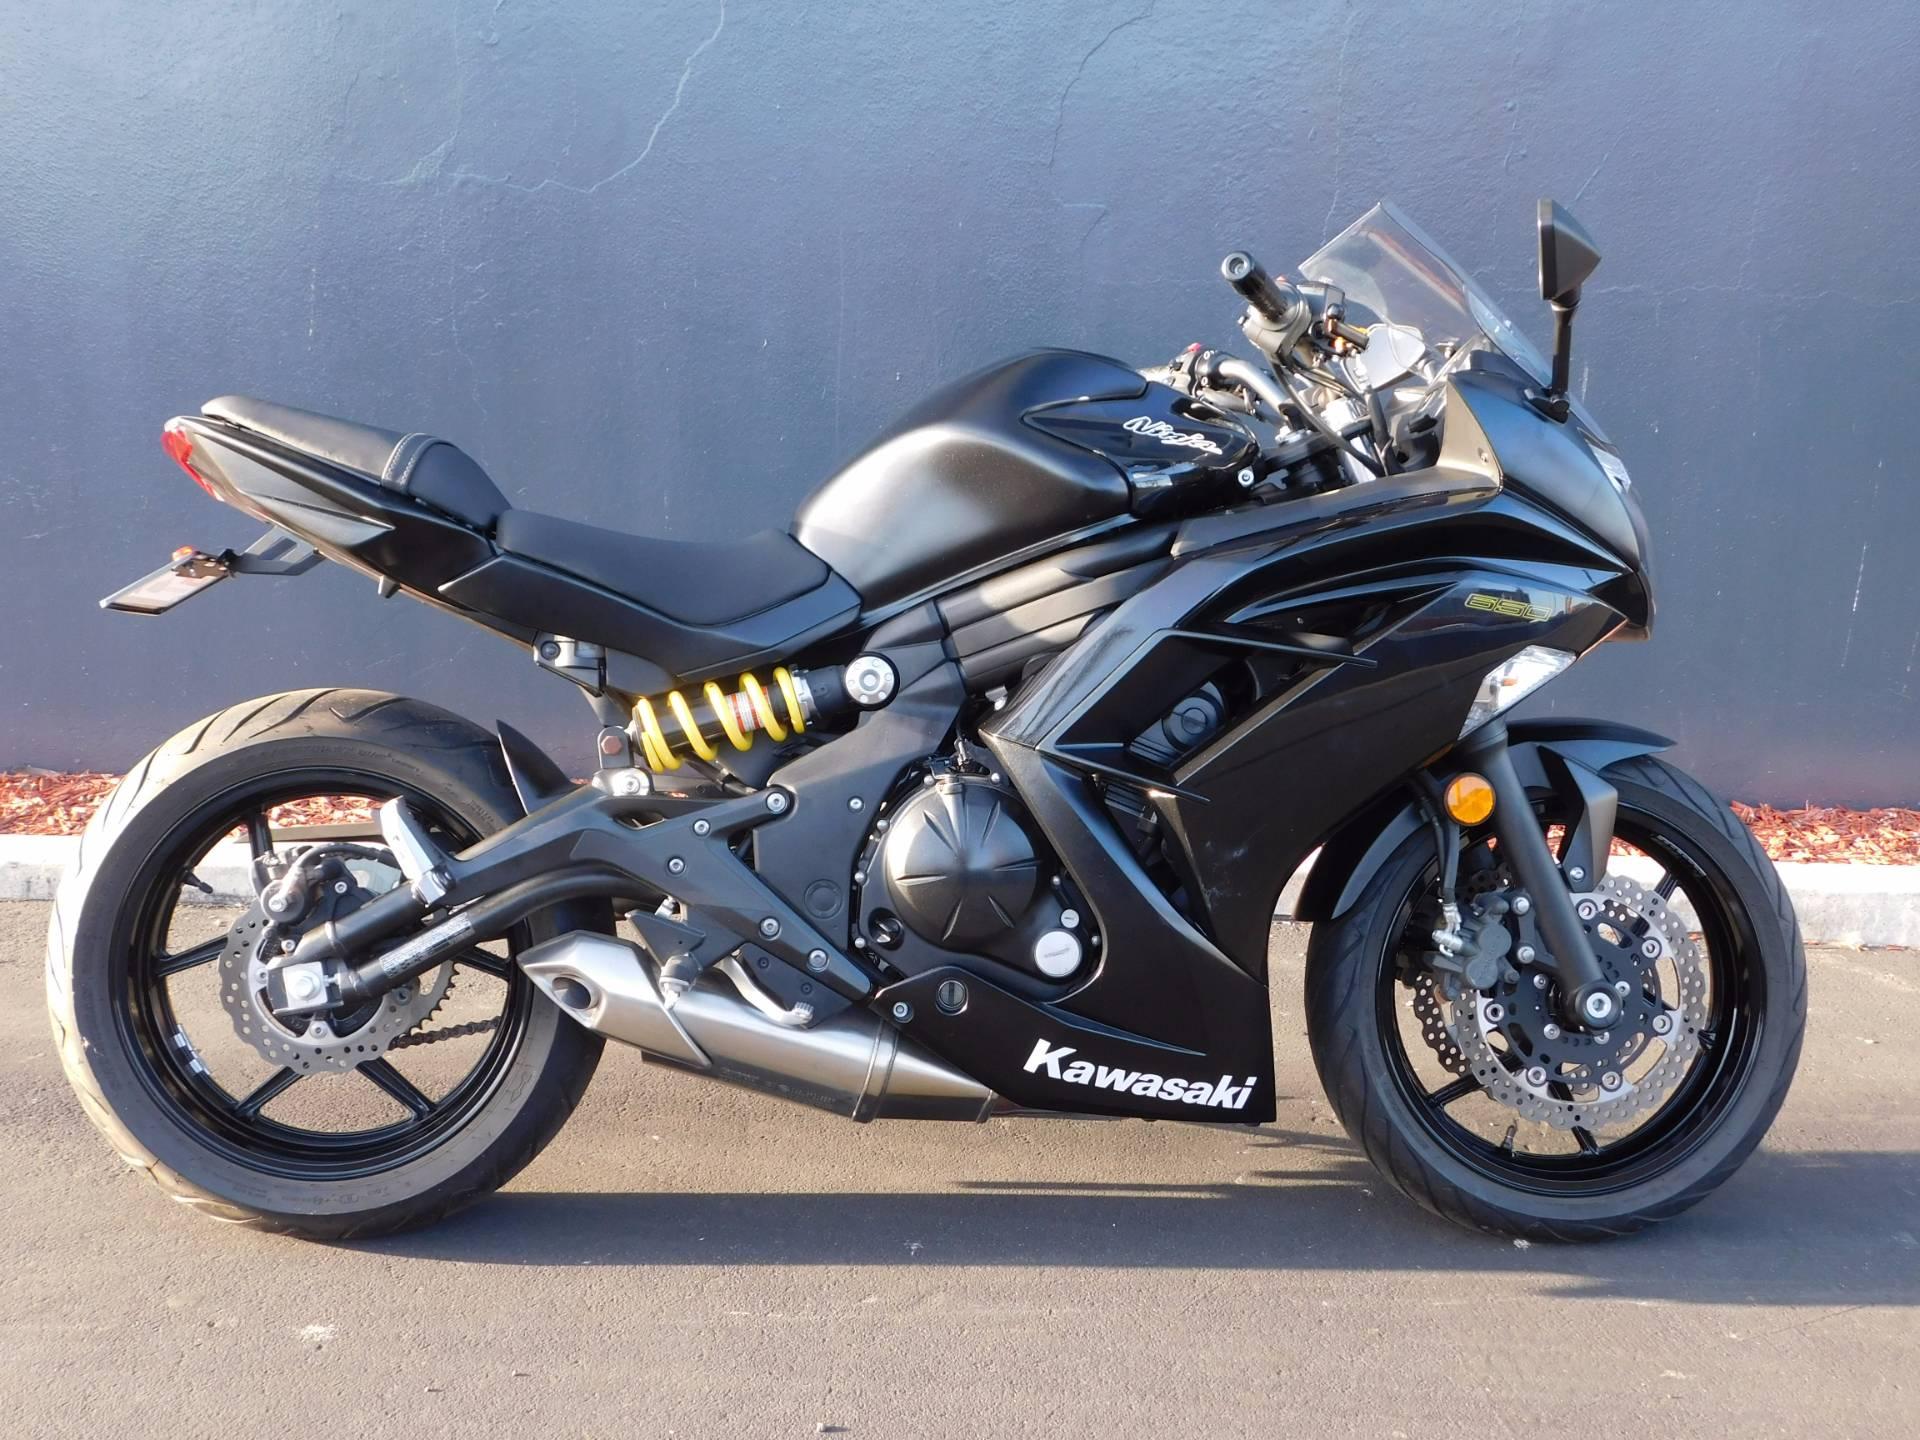 Used 2013 Kawasaki Ninja® 650 Motorcycles in Chula Vista, CA | Stock